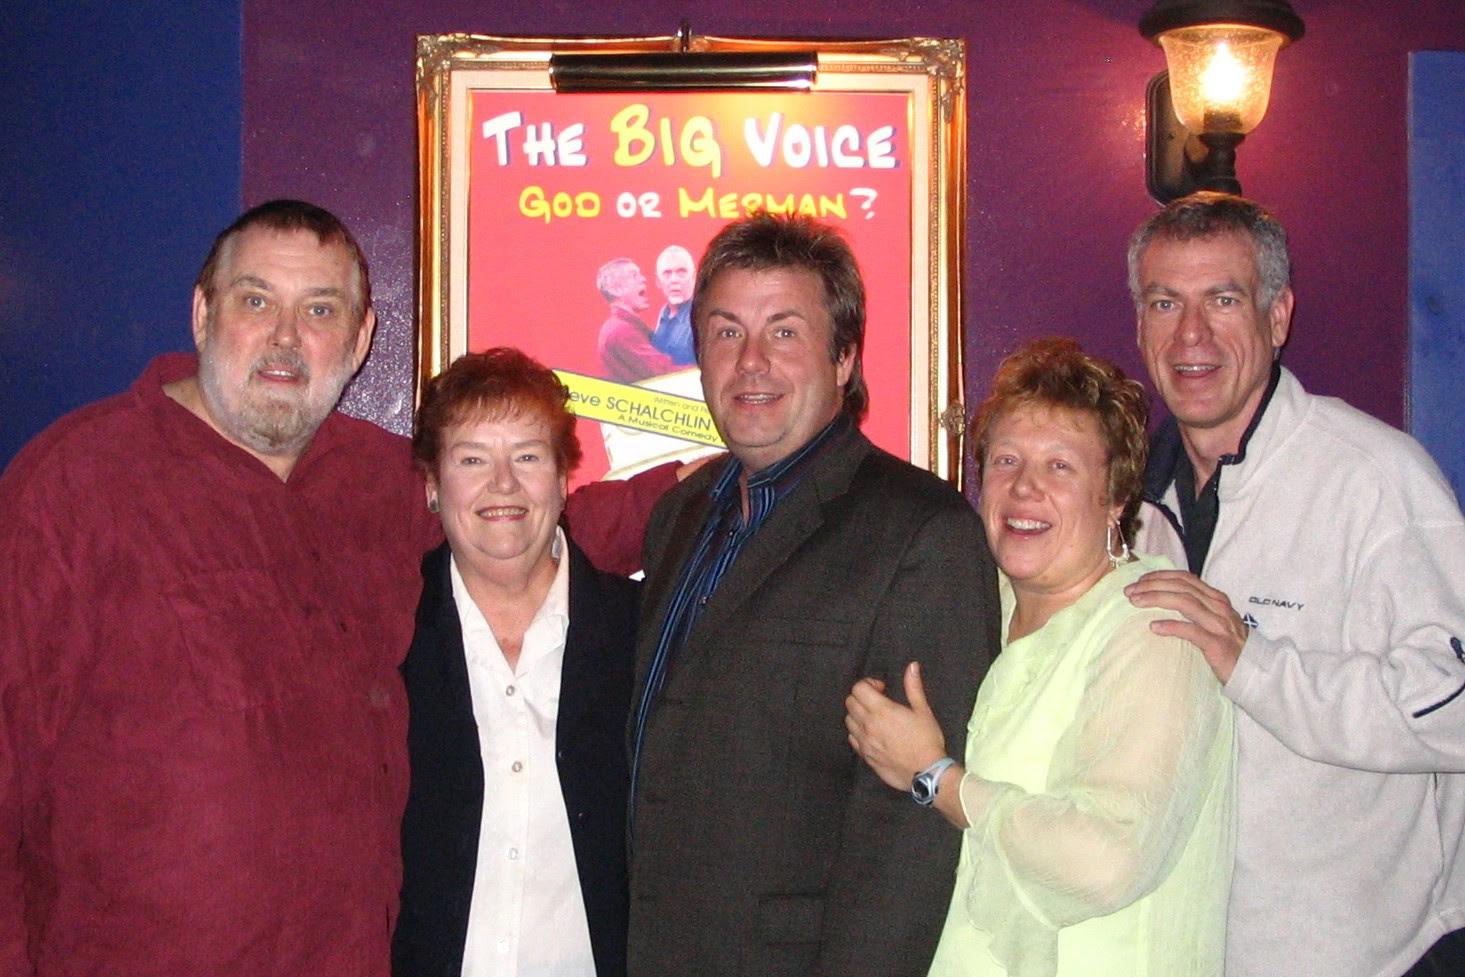 Jim, Janet, Brett, Karen and Steve at The Big Voice: God or Merman